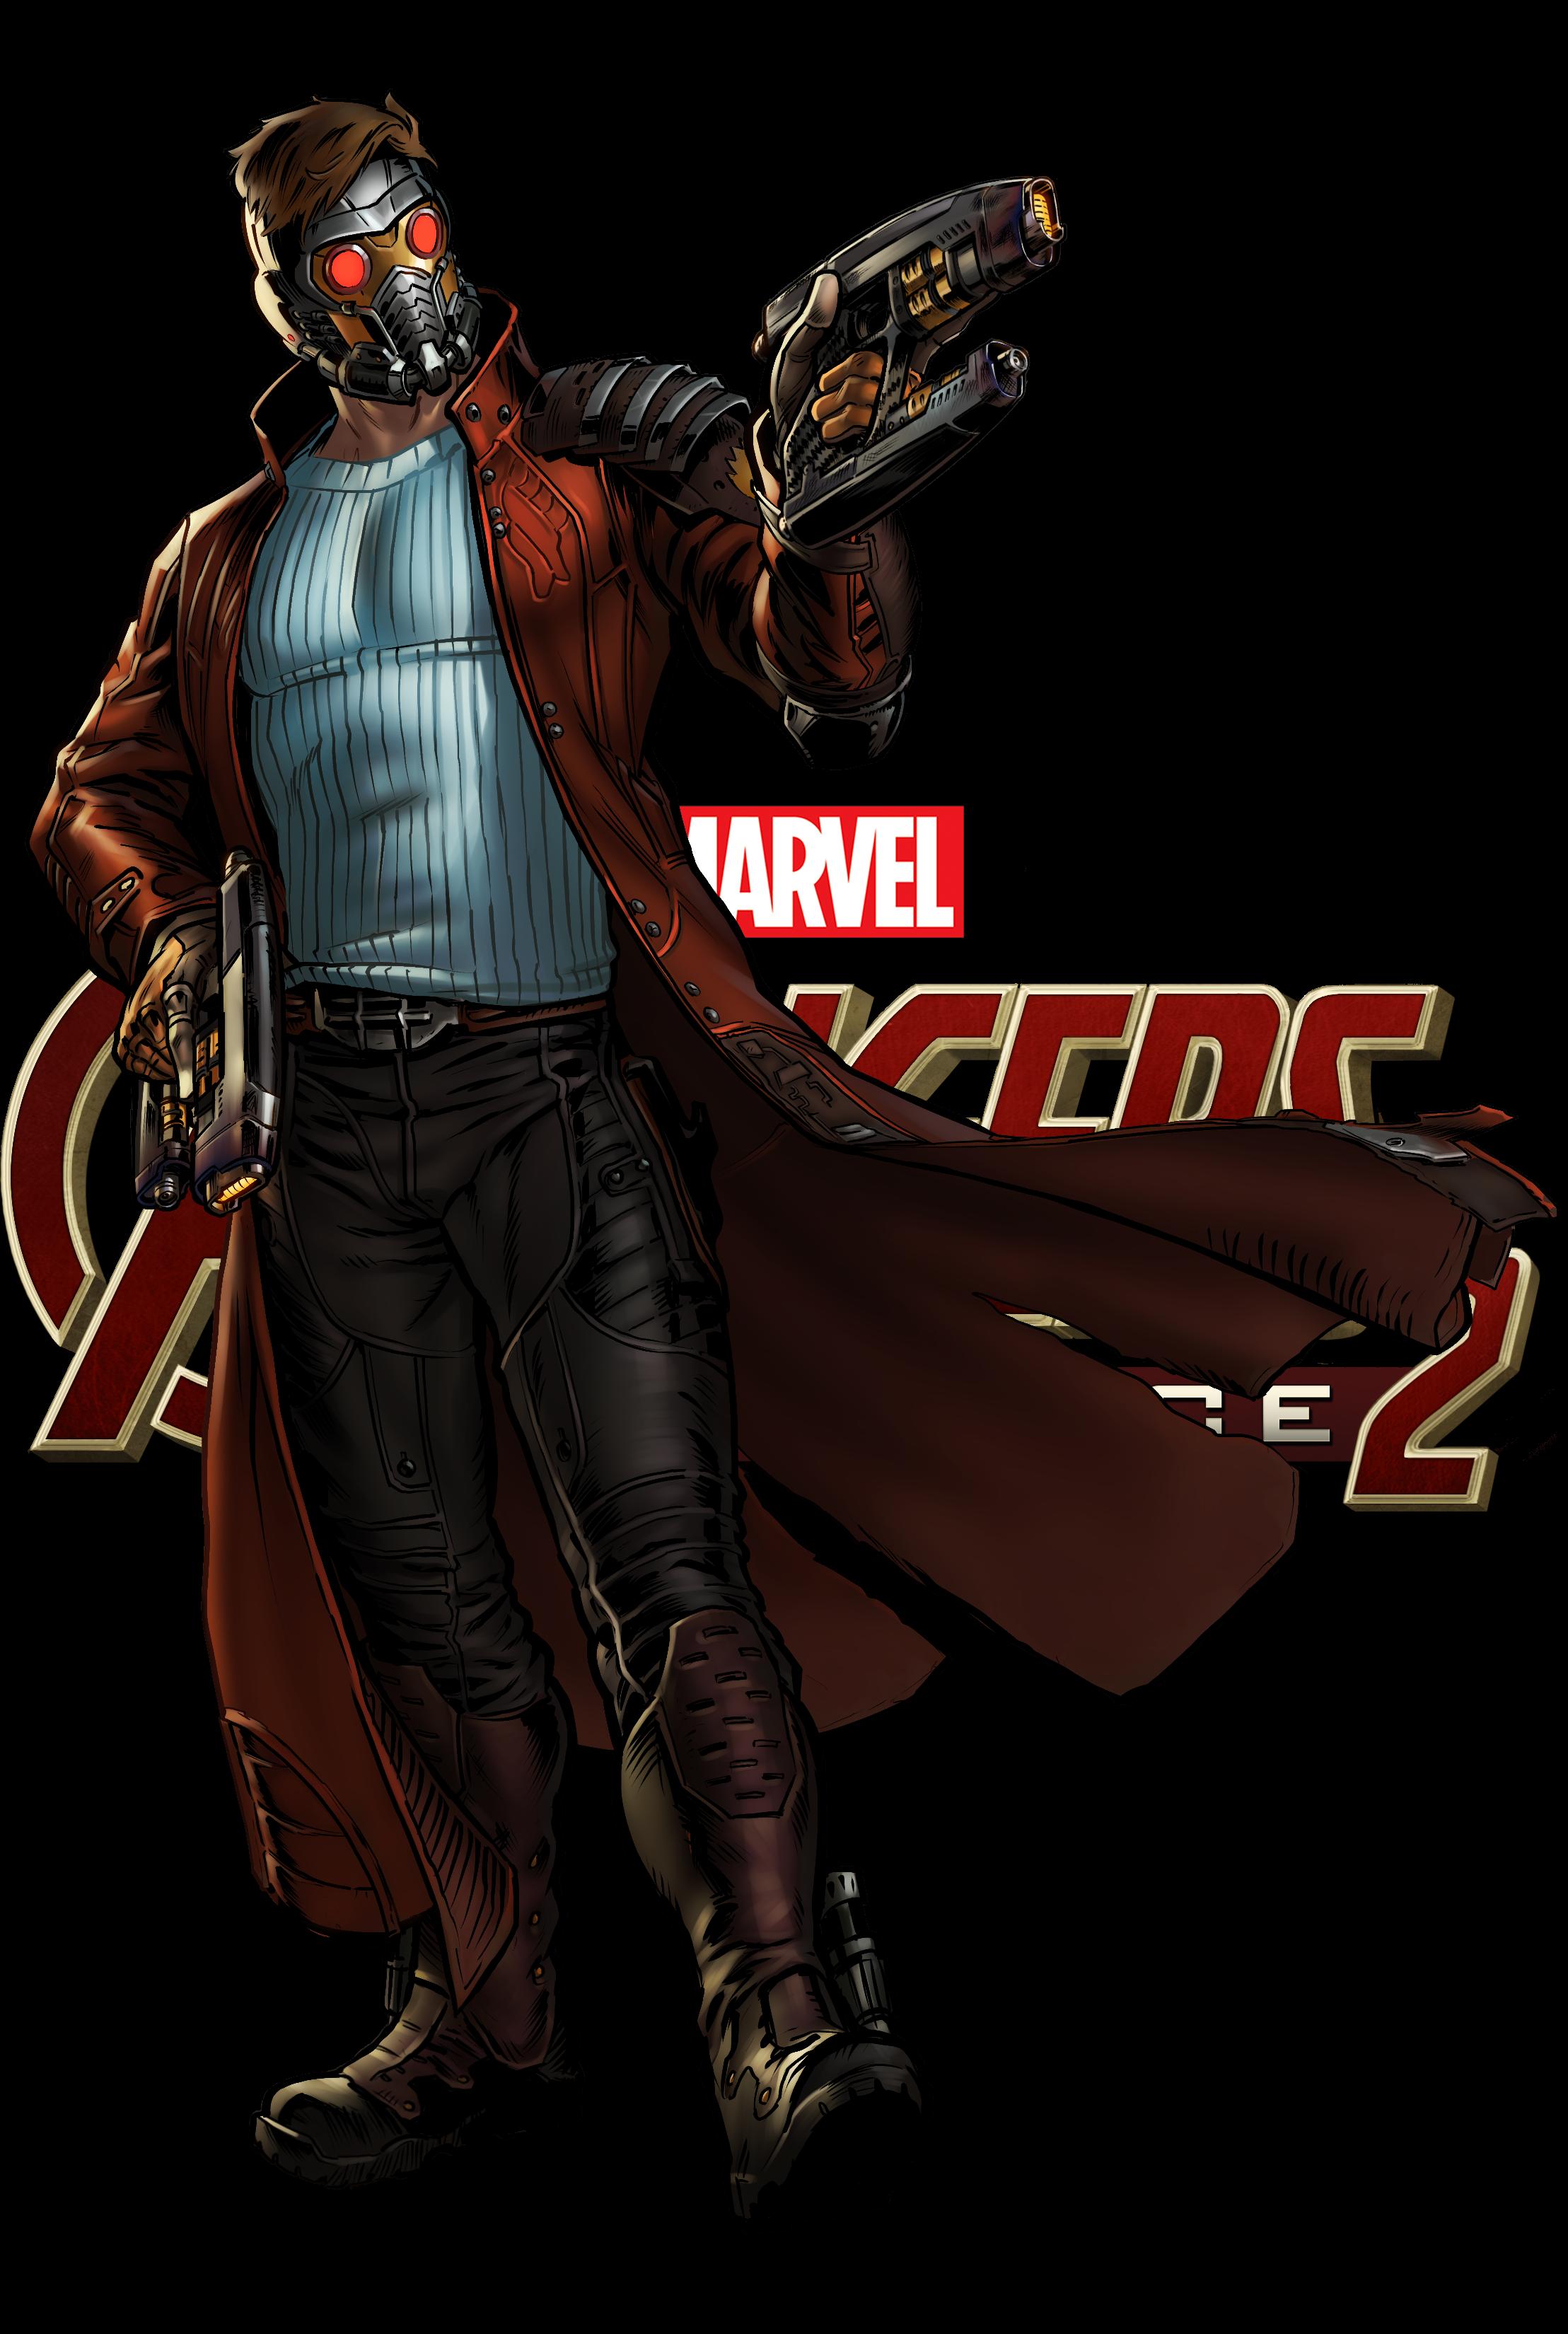 Maa2 Star Lord 01 Logo Png 2217 3300 Star Lord Avengers Poster Superhero Art